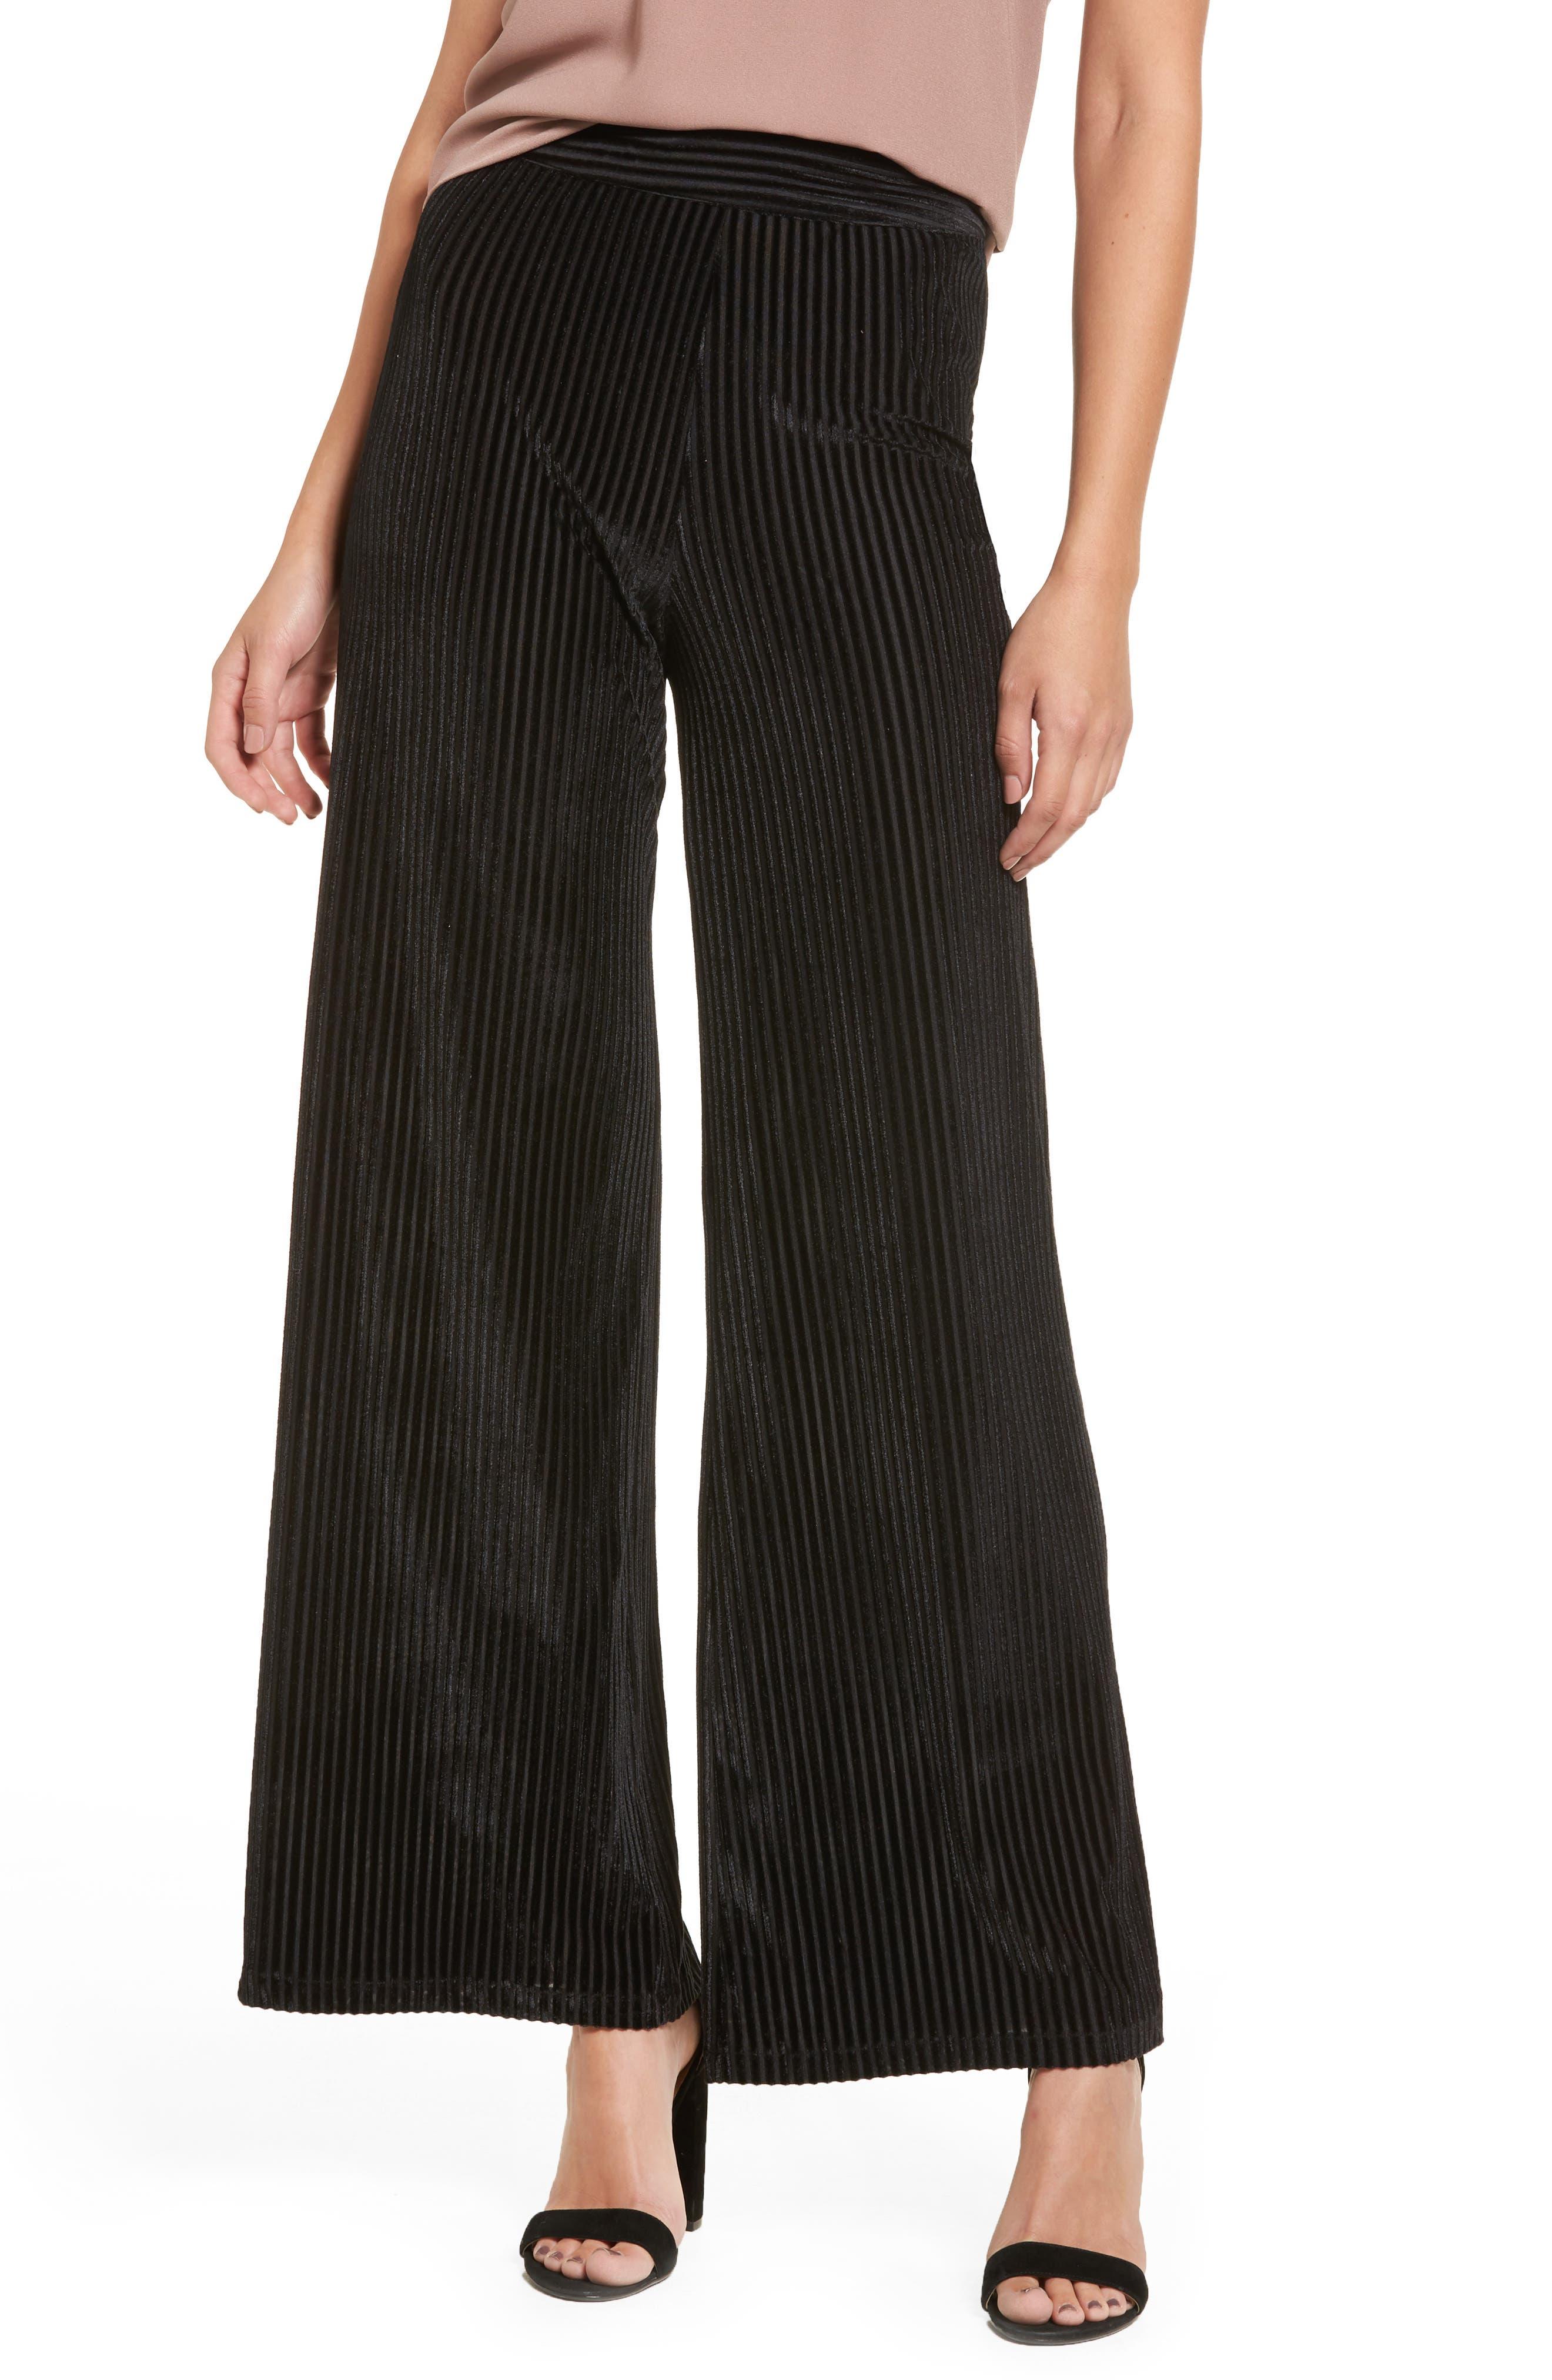 Marley Velvet Pants,                             Main thumbnail 1, color,                             Black